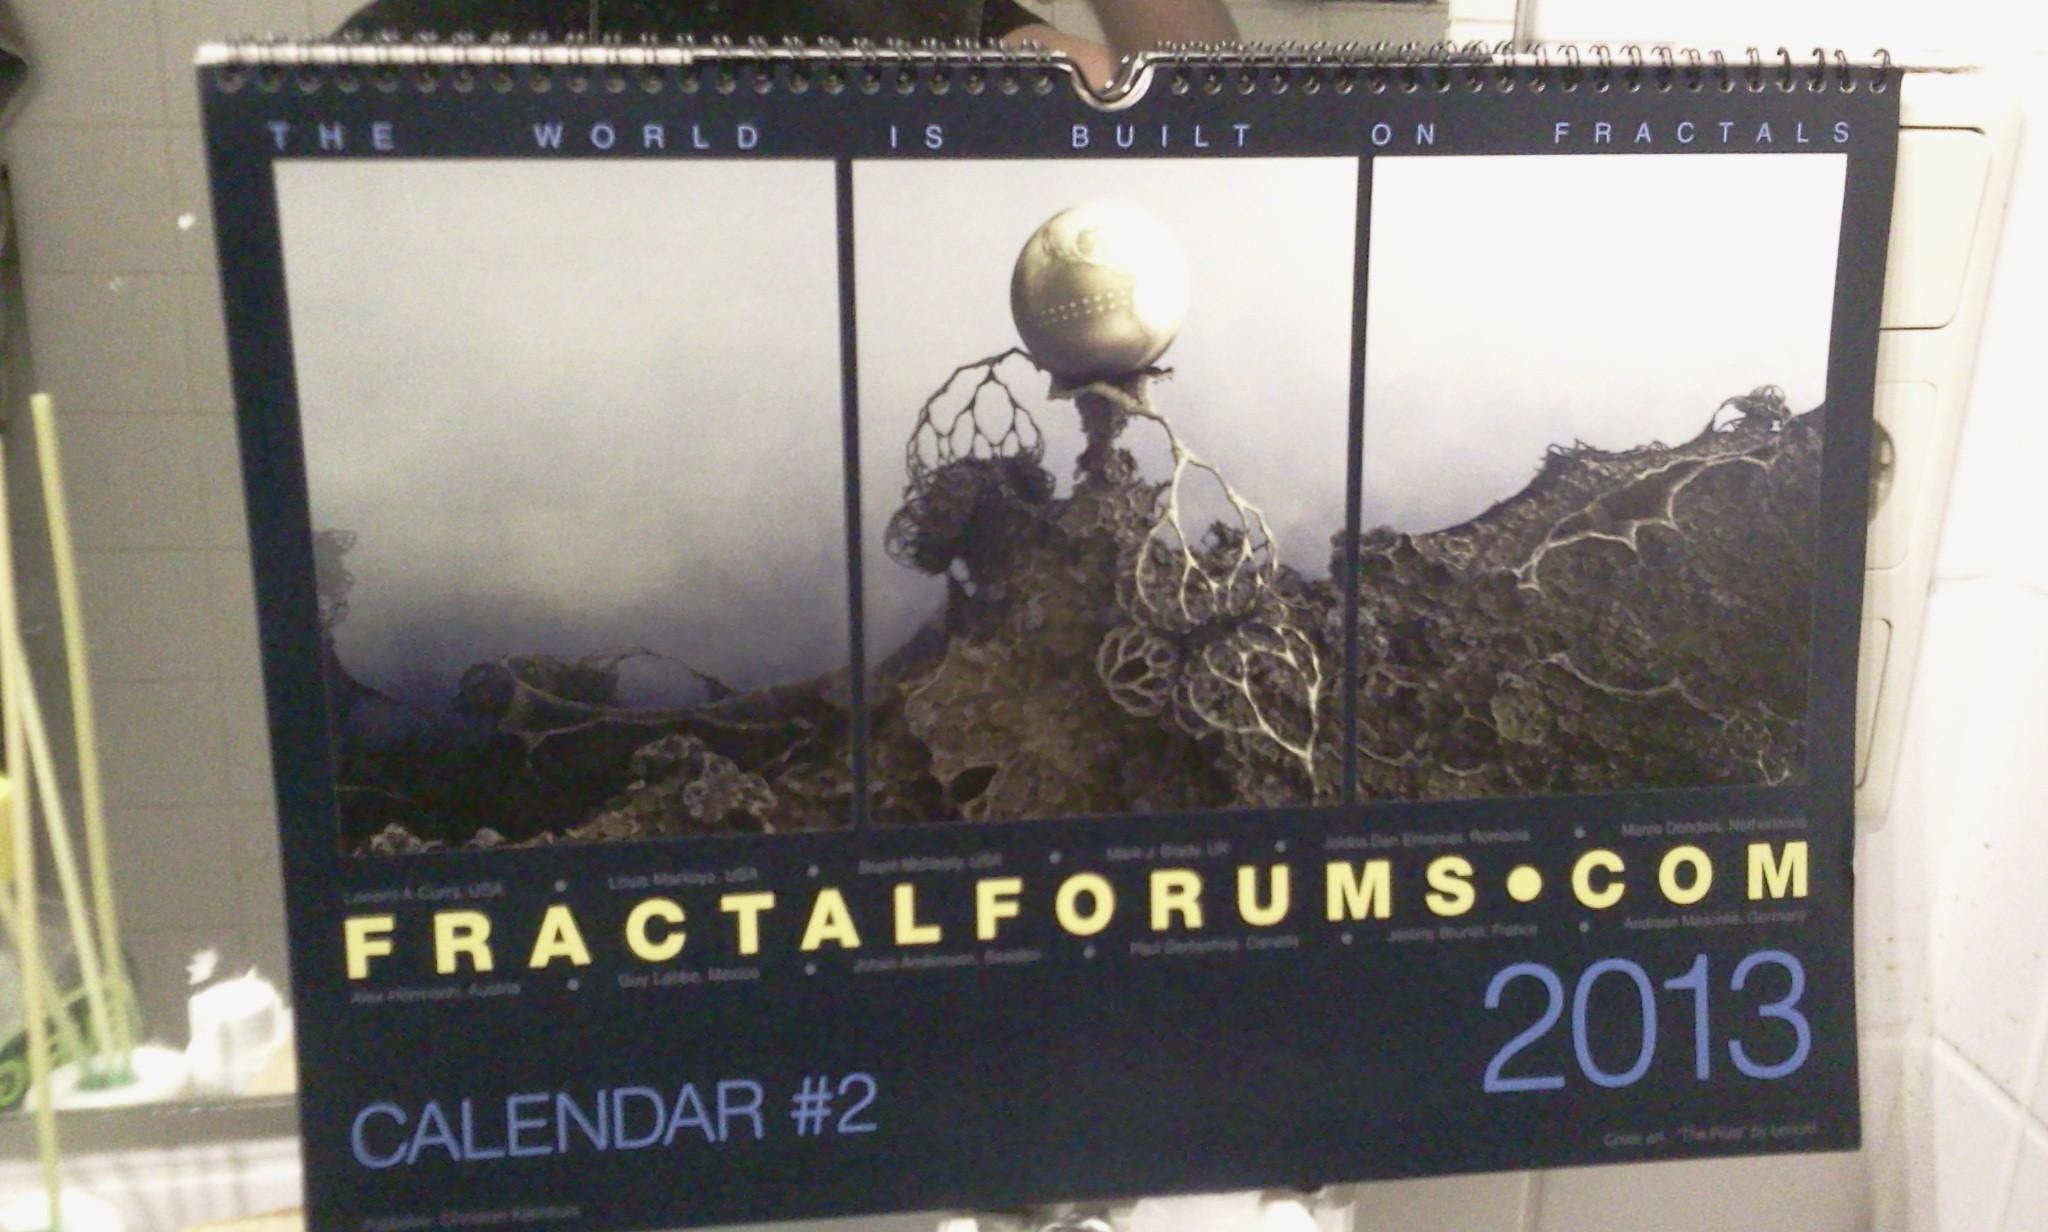 "fractalforums.com Calendar #2 2013 -""the world is built on fractals"""